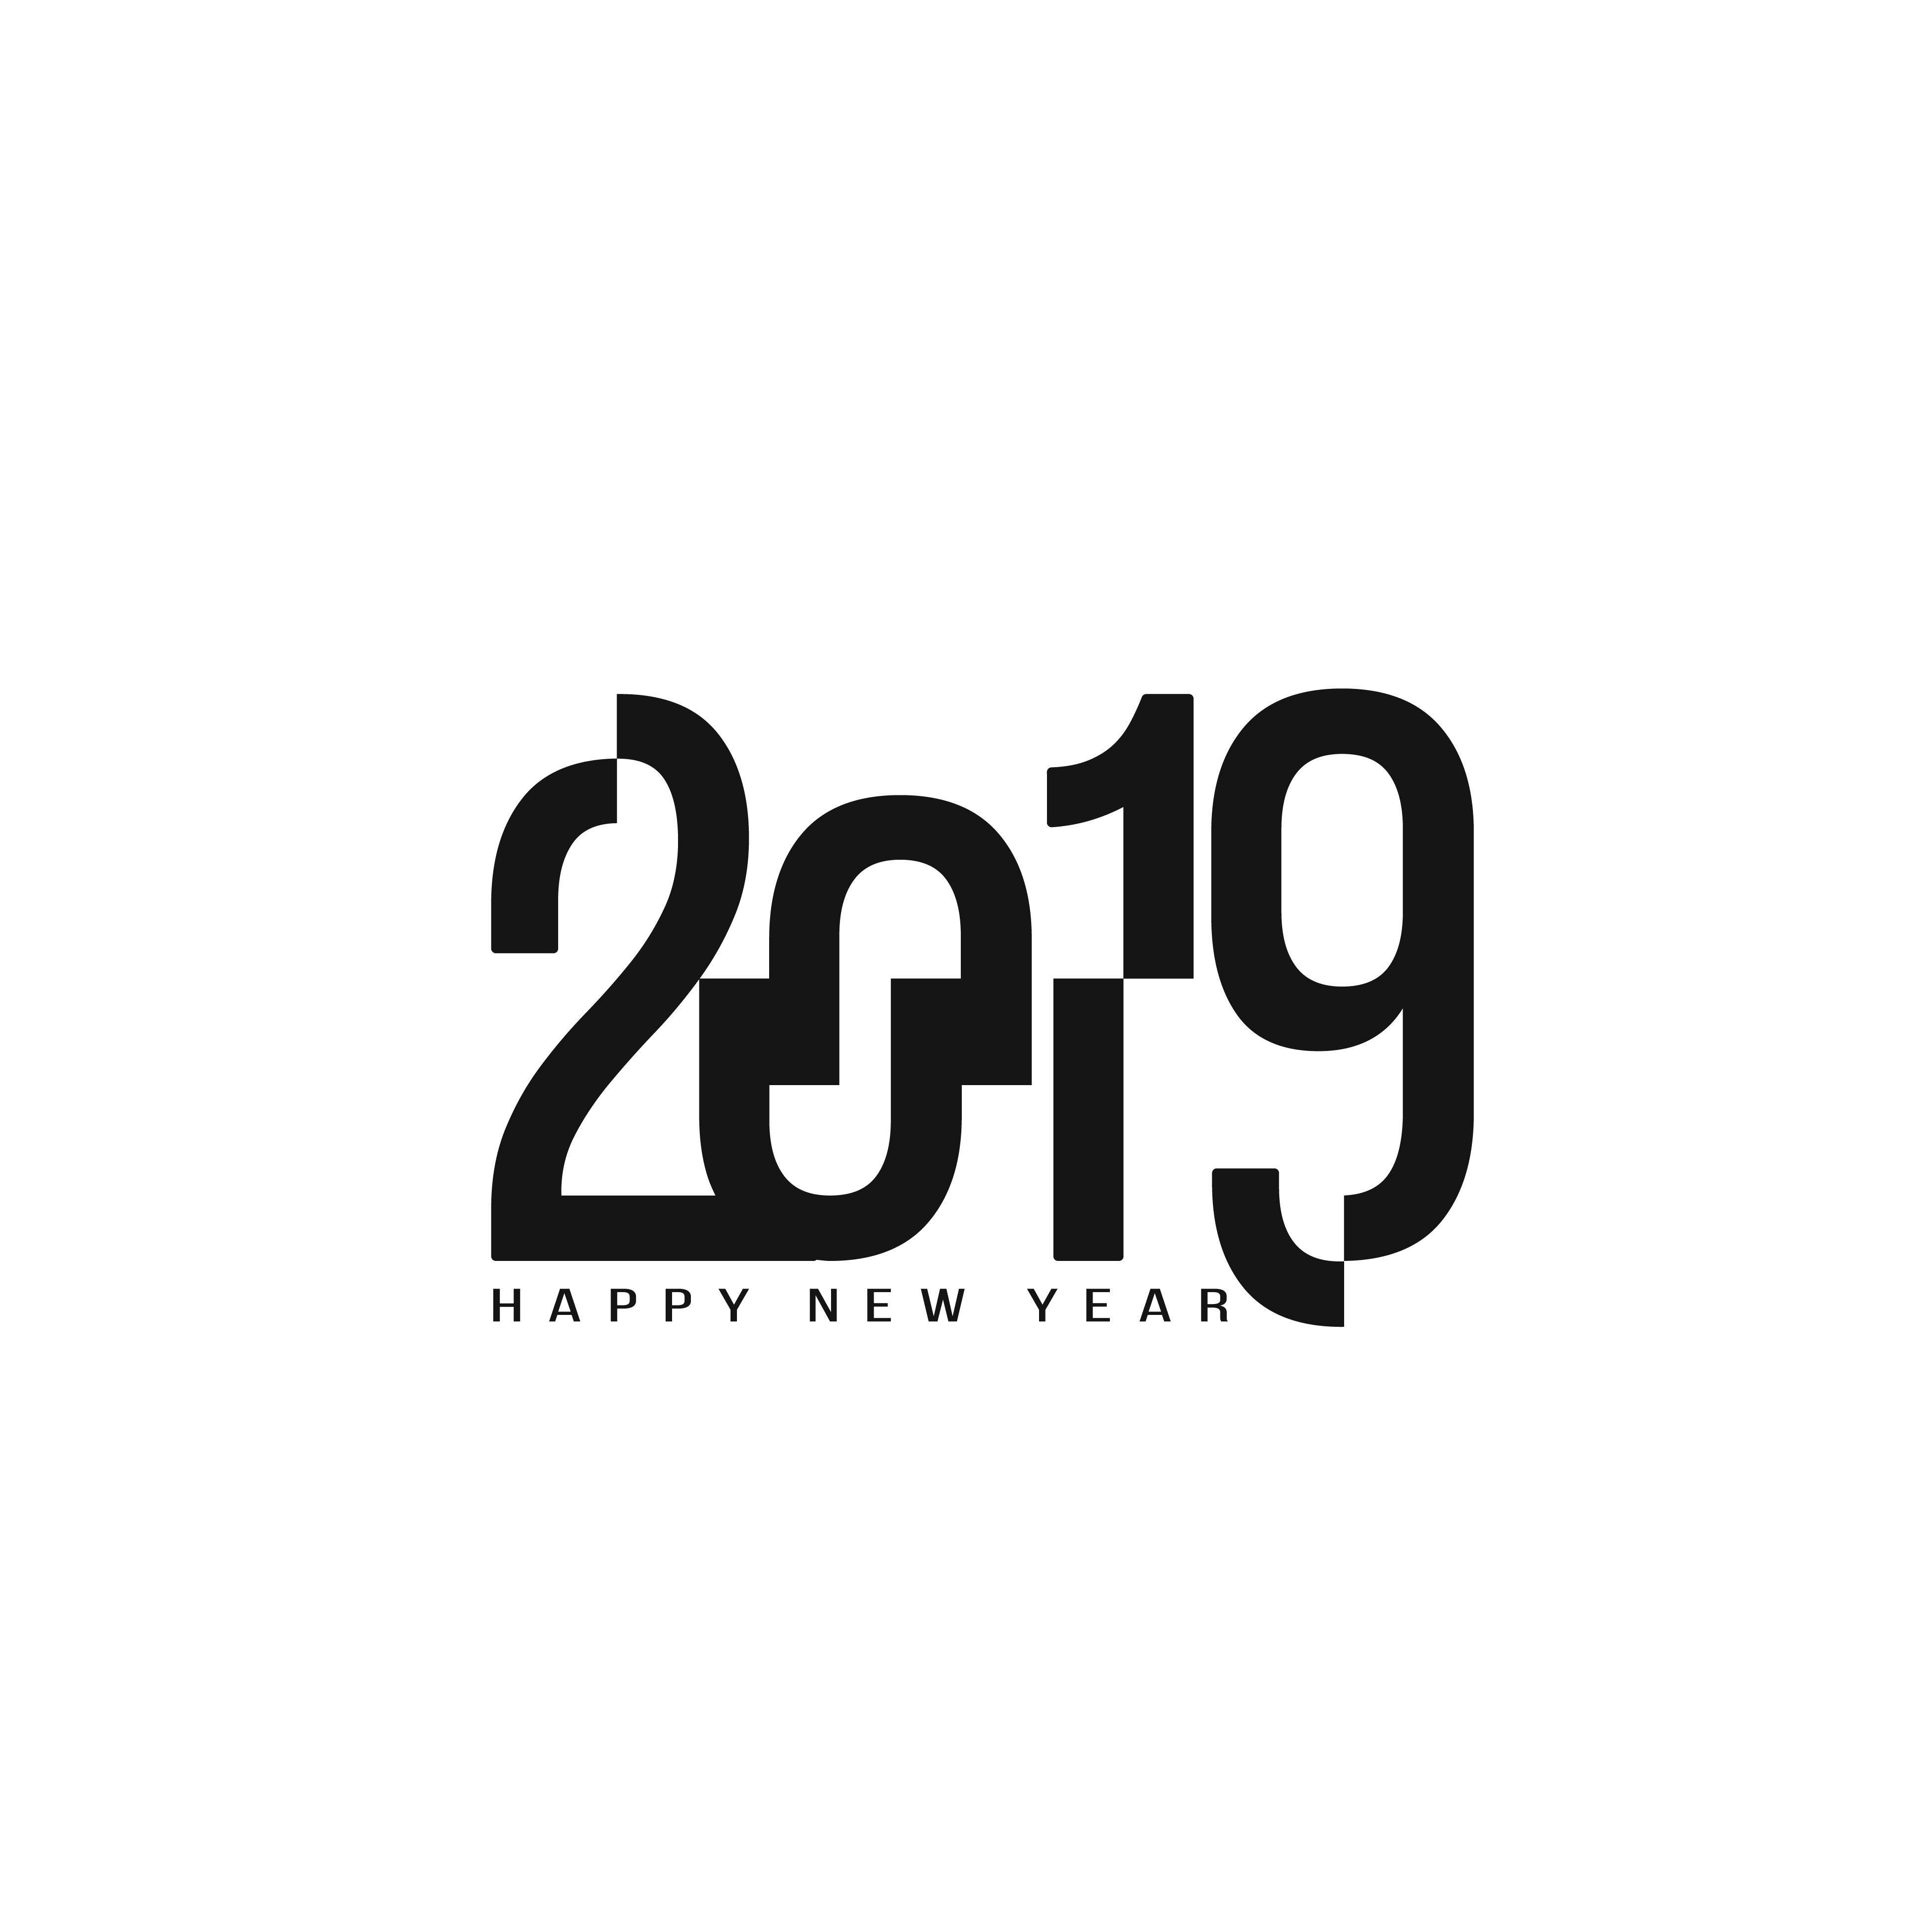 新年快乐创意2019时尚字体矢量素材 Happy New Year 2019 Stylish Text Design插图(5)